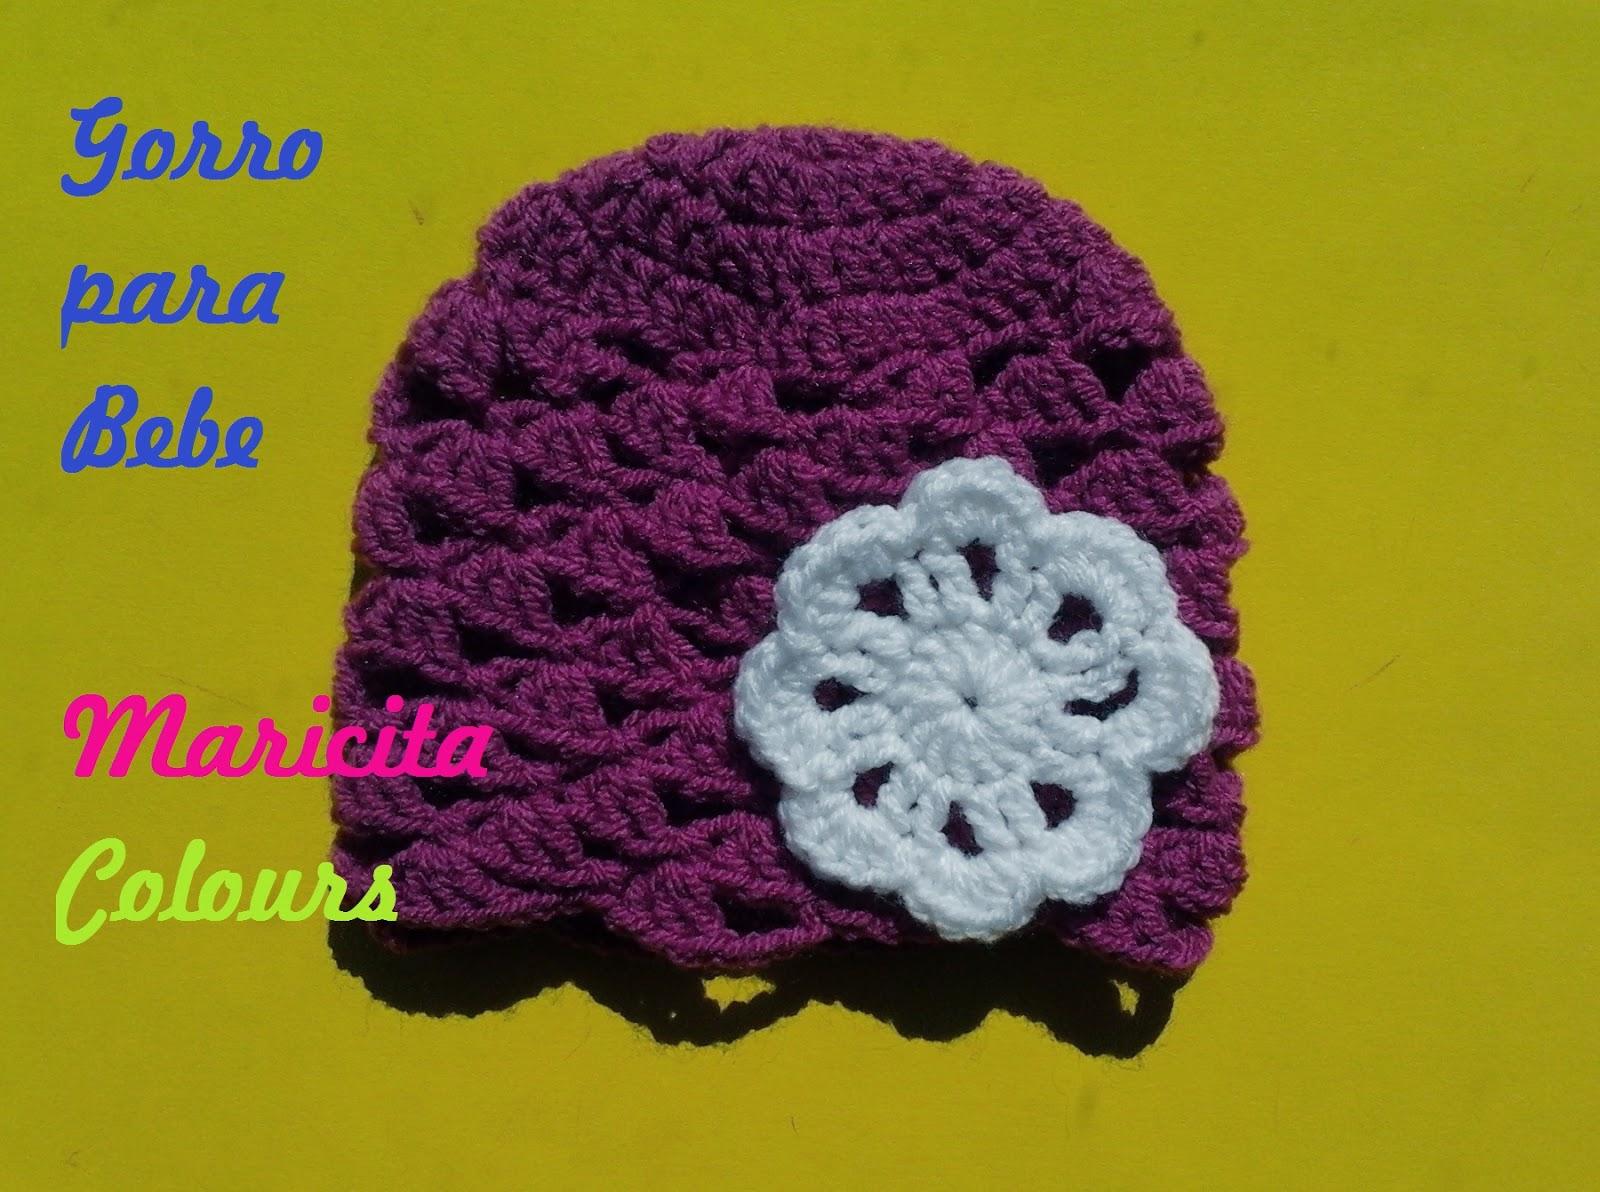 Tejidos Por Maricita Colours Crochet Häkeln Tutorial Gorro Bebe